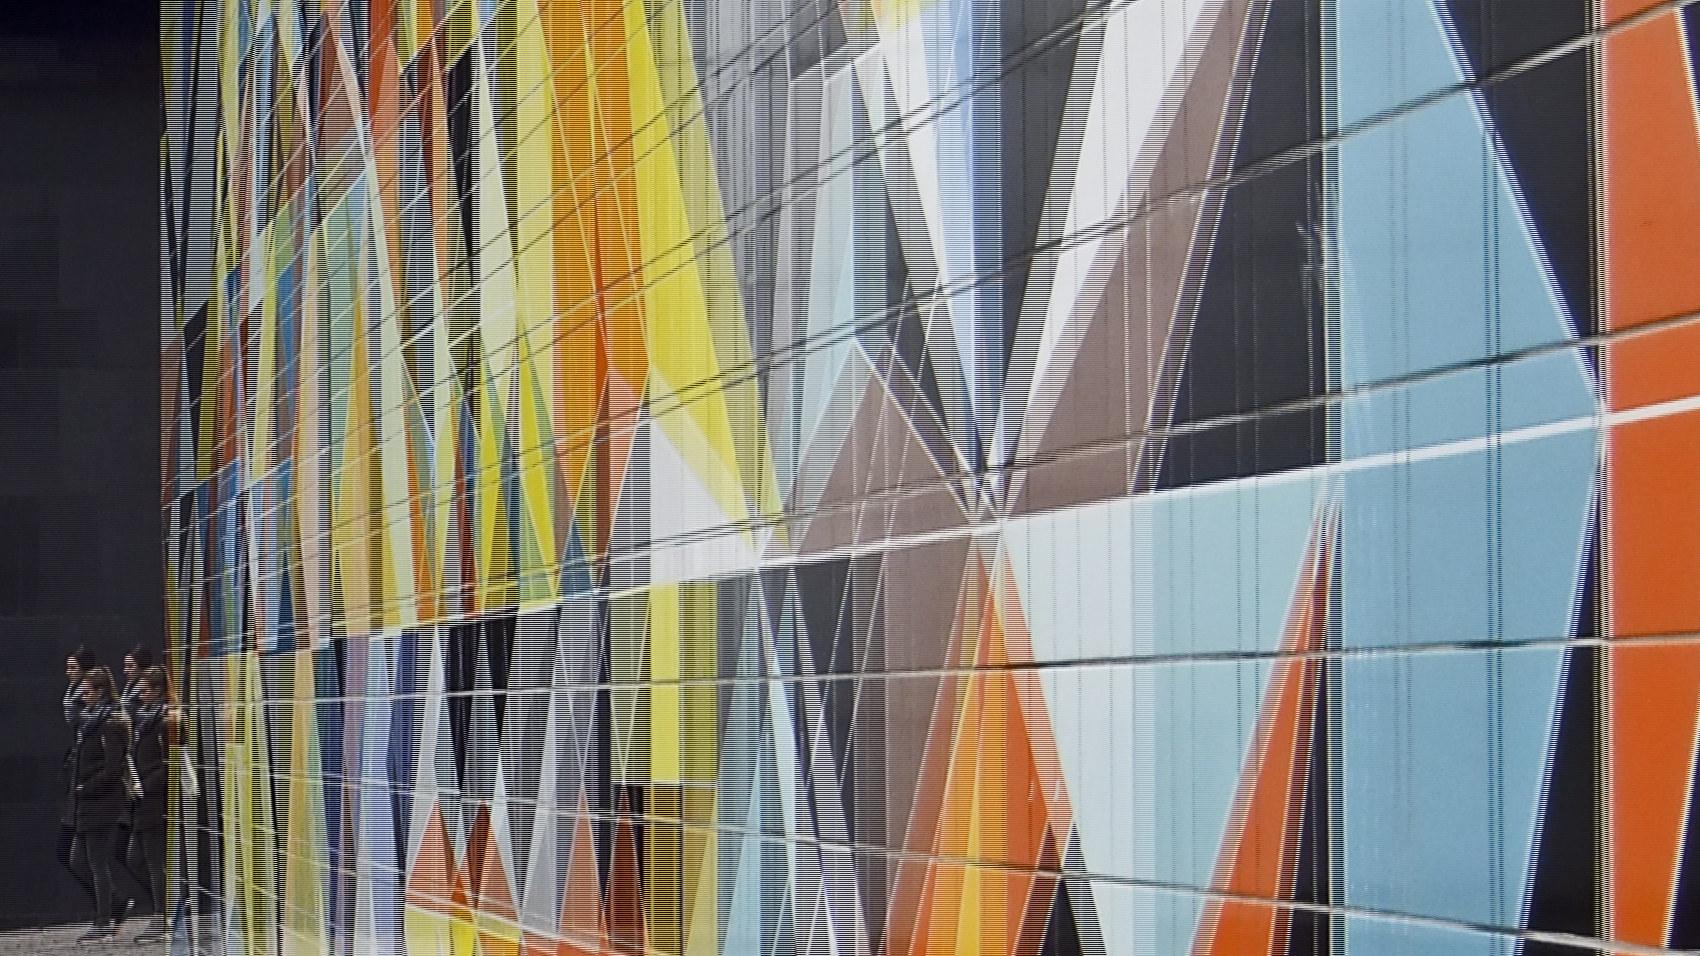 Paul-Klee-Platz (3D interlaced)